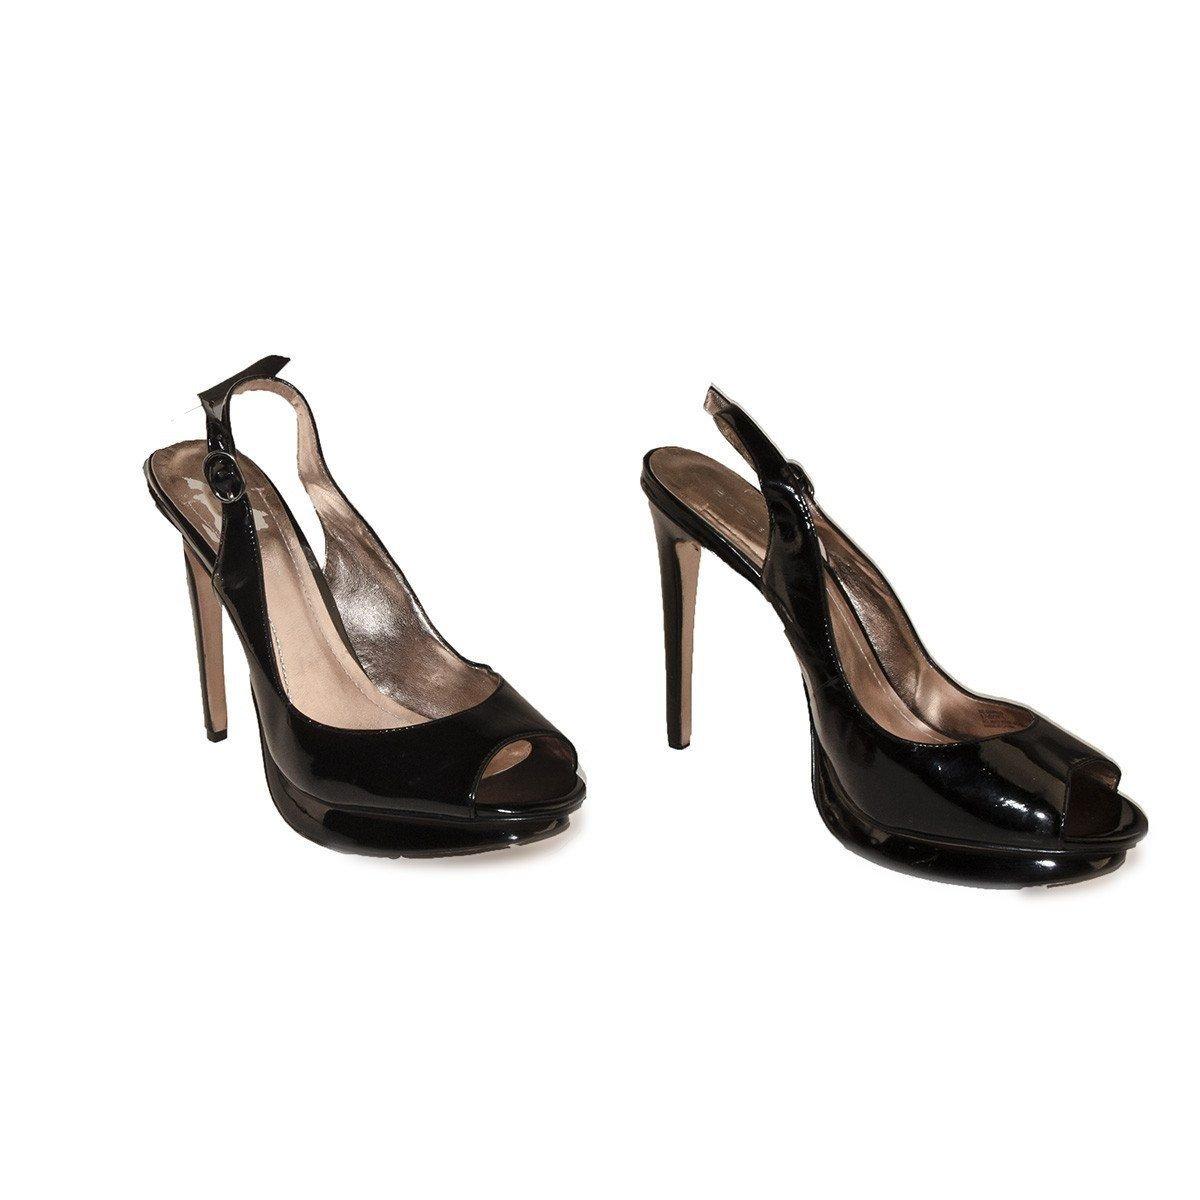 Black Patent Leather Peep Toe Slingback Stilettos, BCBGeneration, Size 8.5